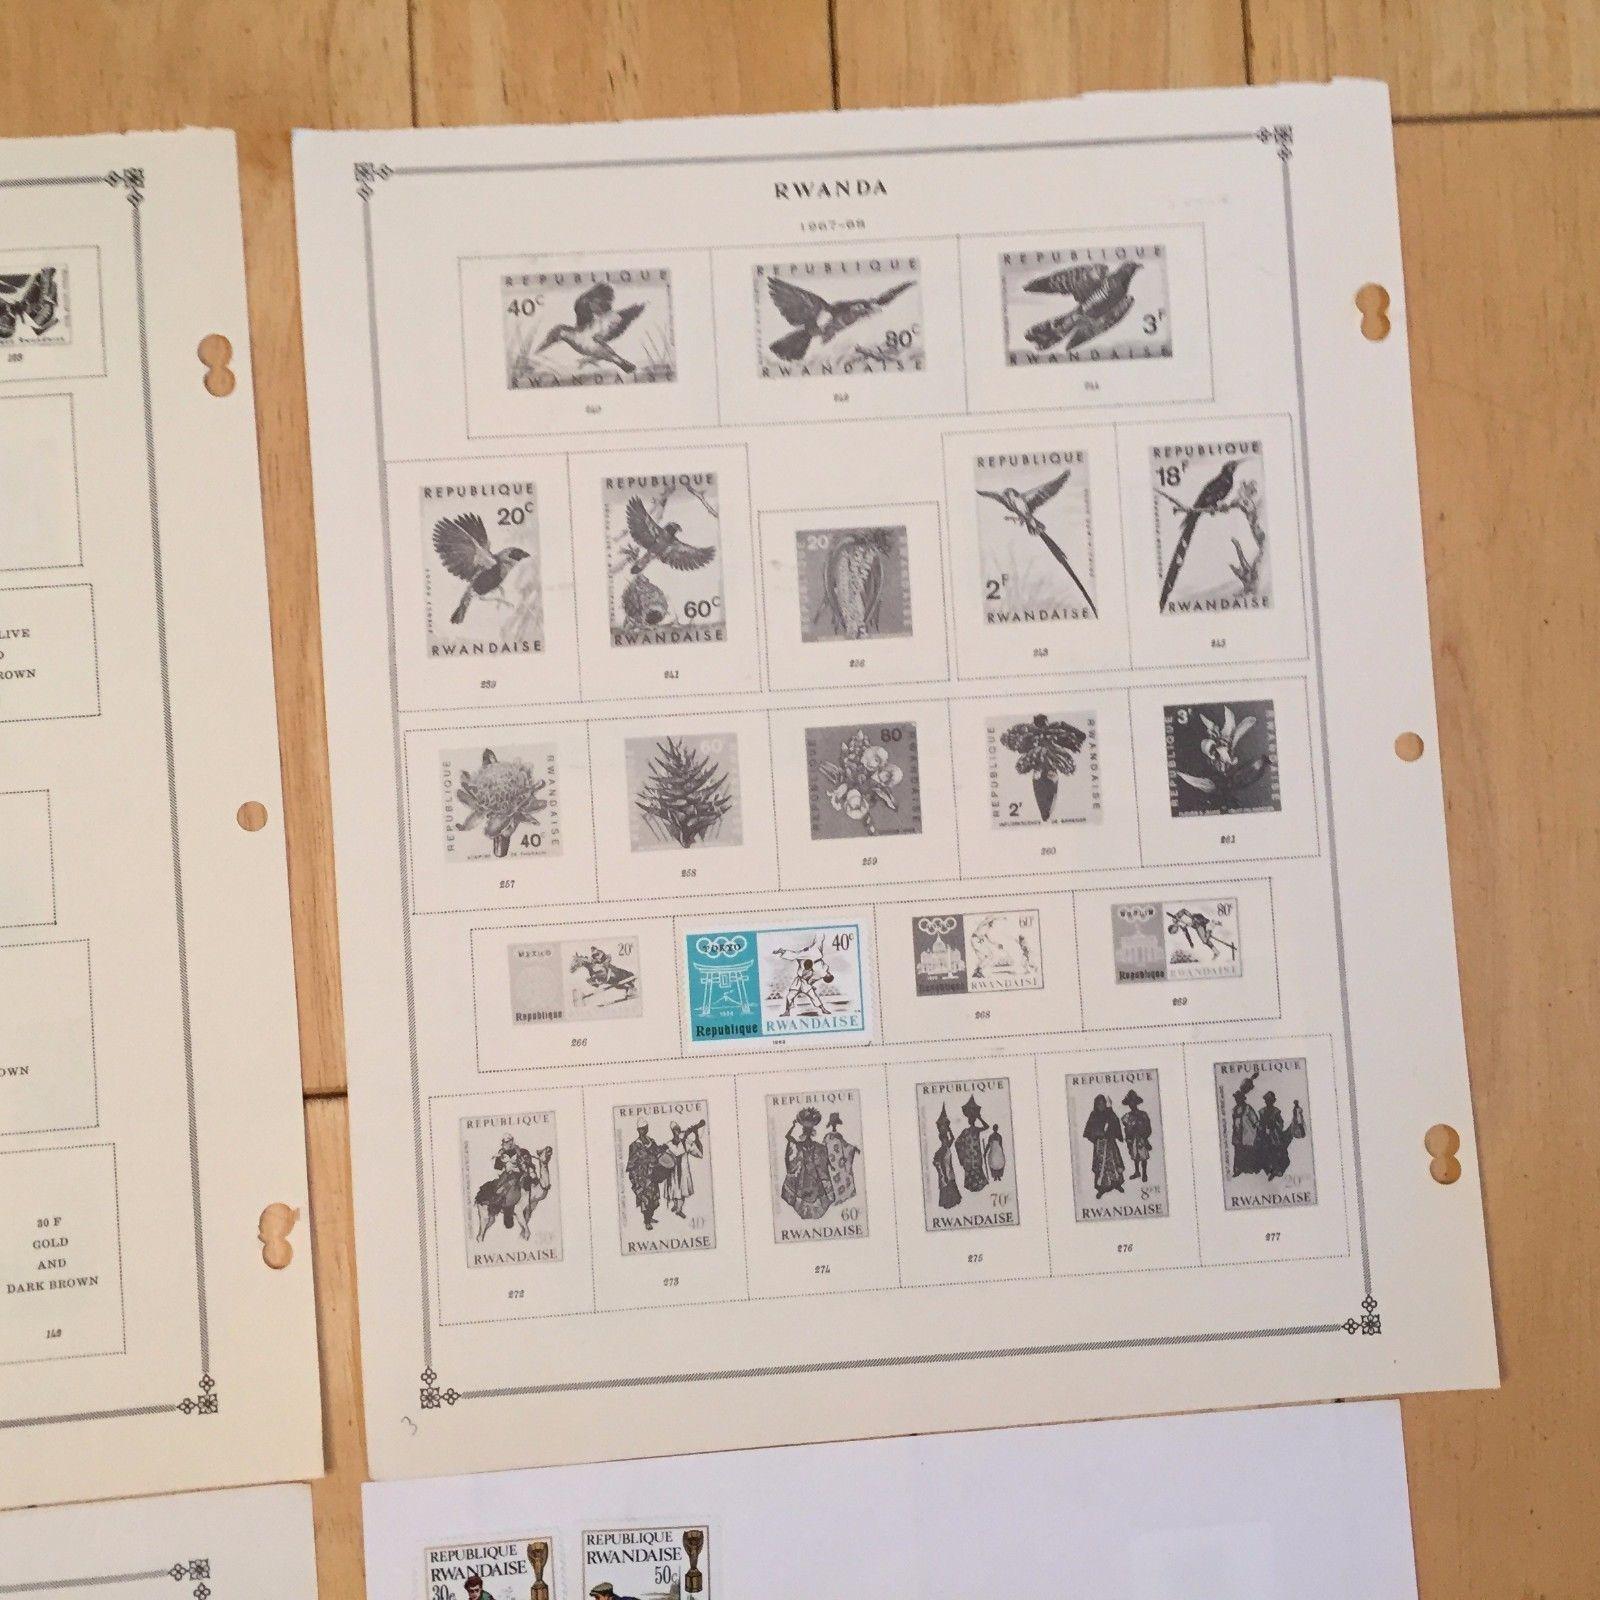 G59 Rwanda 1964 - 1974 Hinged Stamps Scott and Plain Sheets Olympics Republique